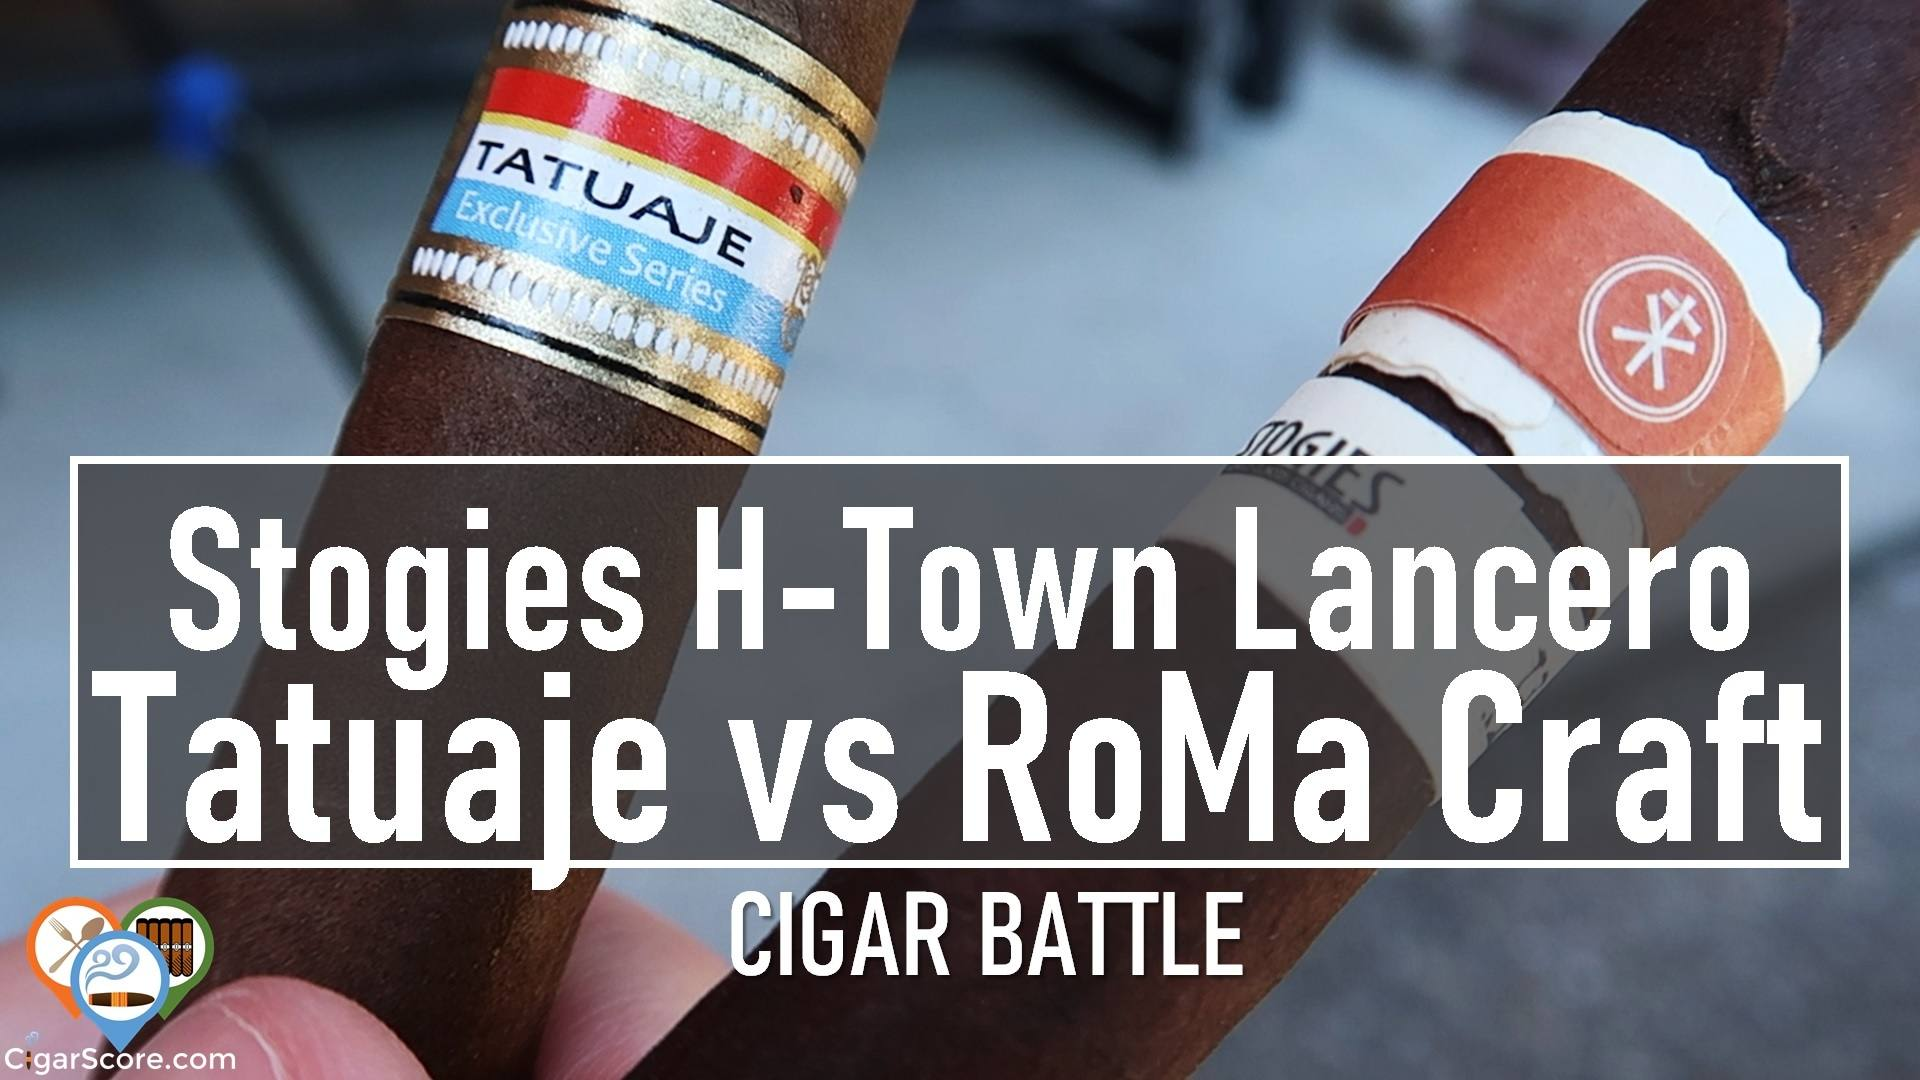 Cigar Battle - Stogies H-Town Lanceros Tatuaje vs RoMa Craft